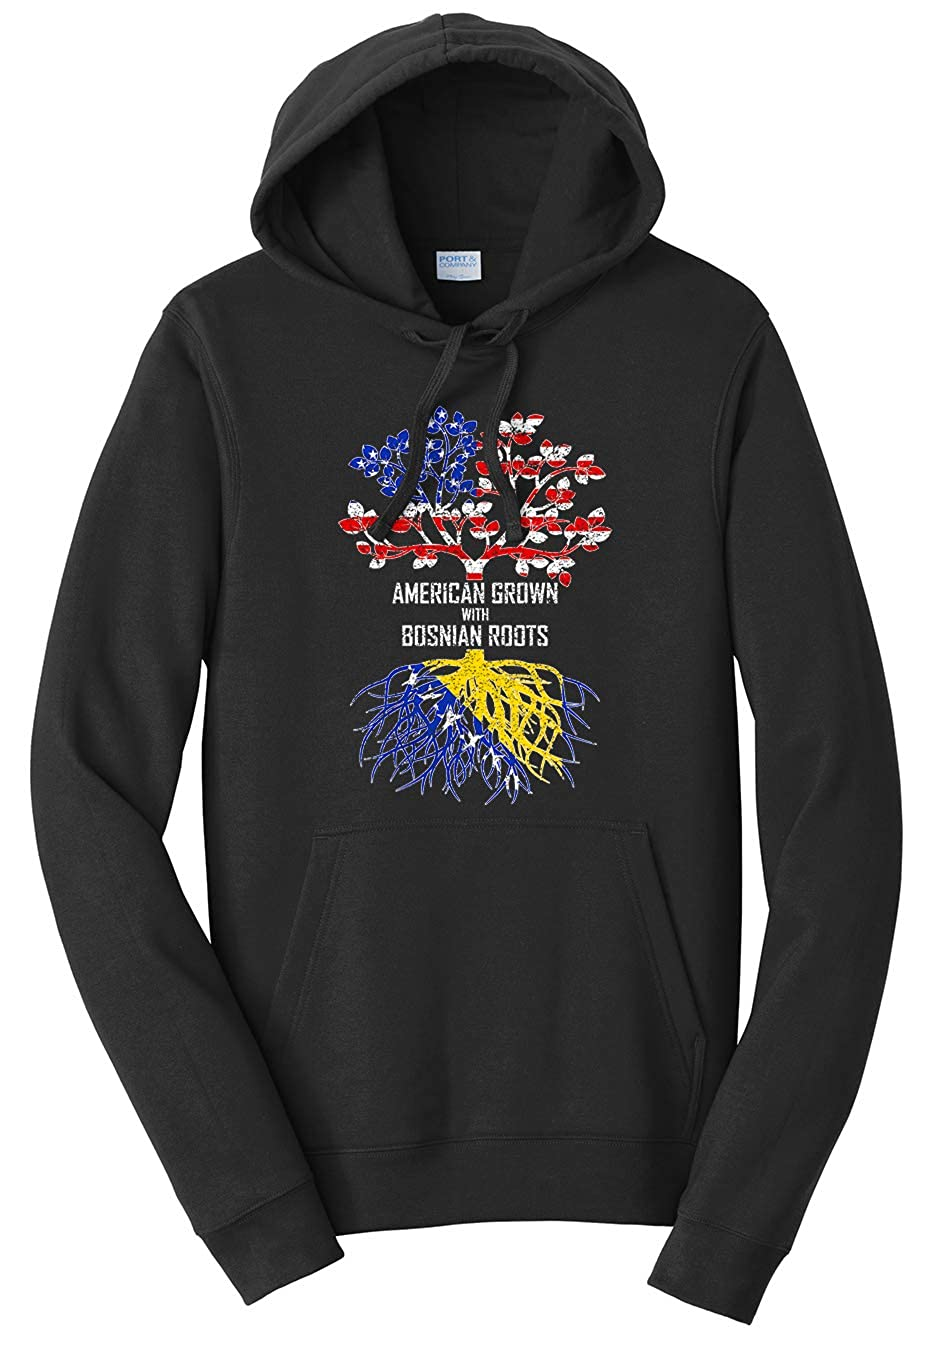 Tenacitee Unisex American Grown with Bosnian Roots Sweatshirt